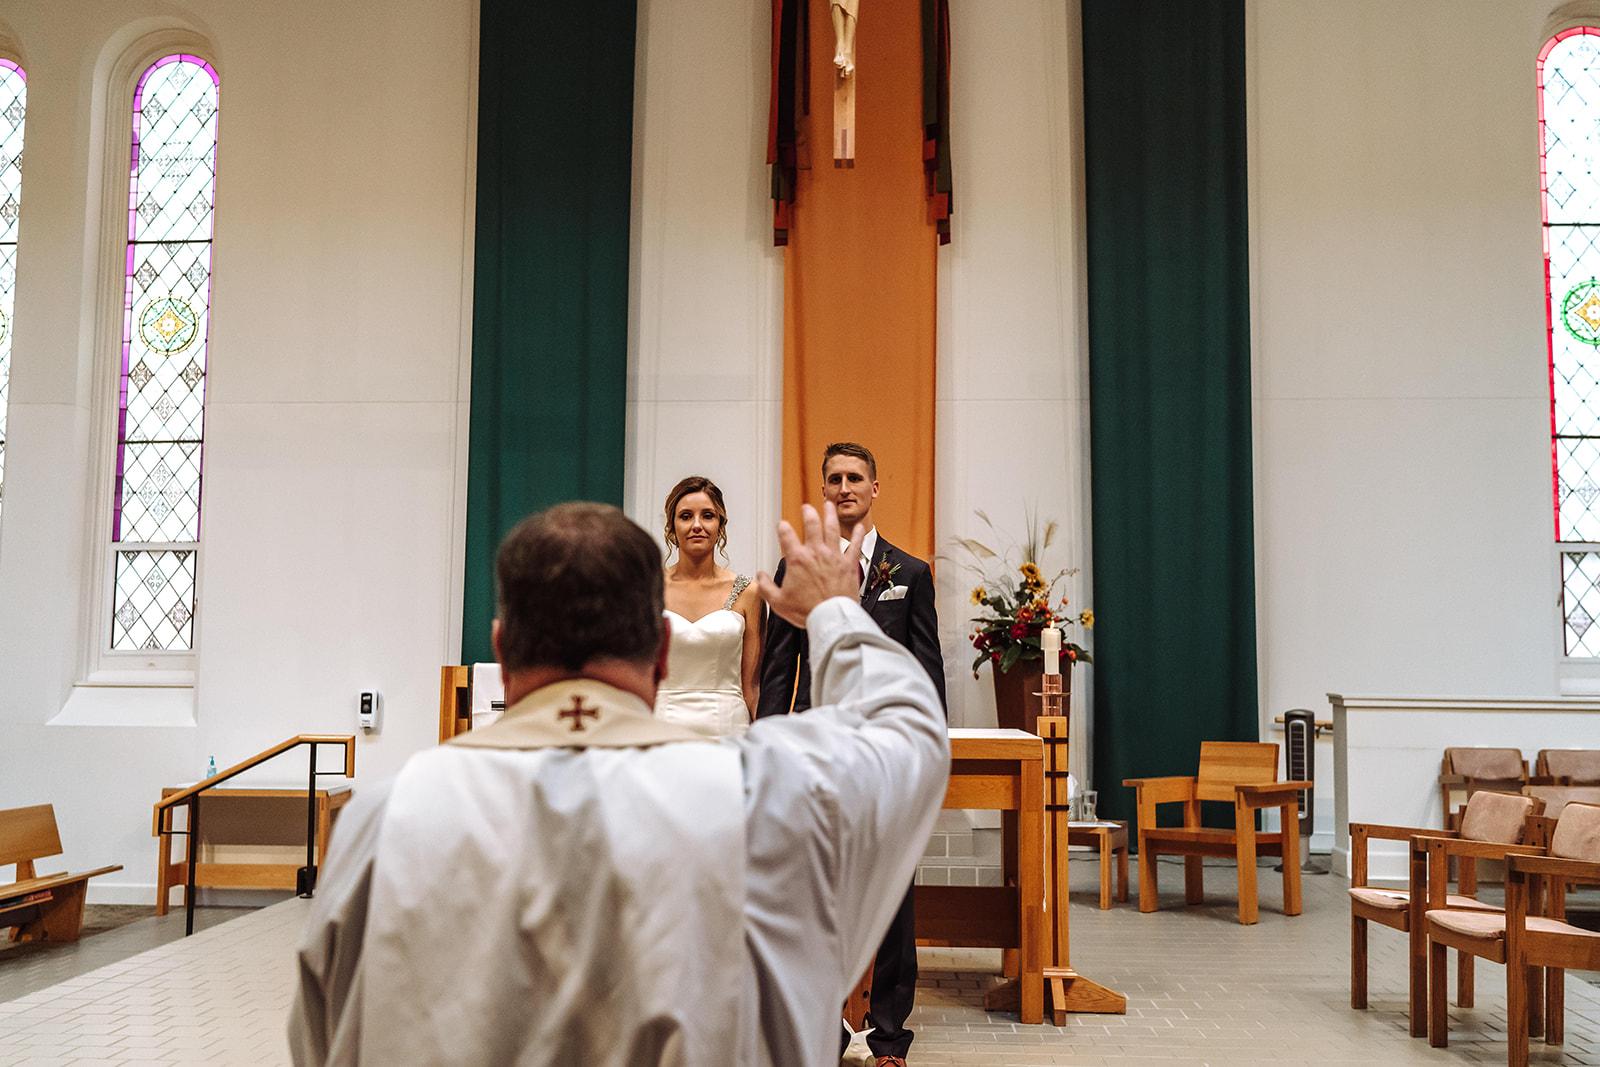 Scott and Andrea Wedding 2018-579.jpg